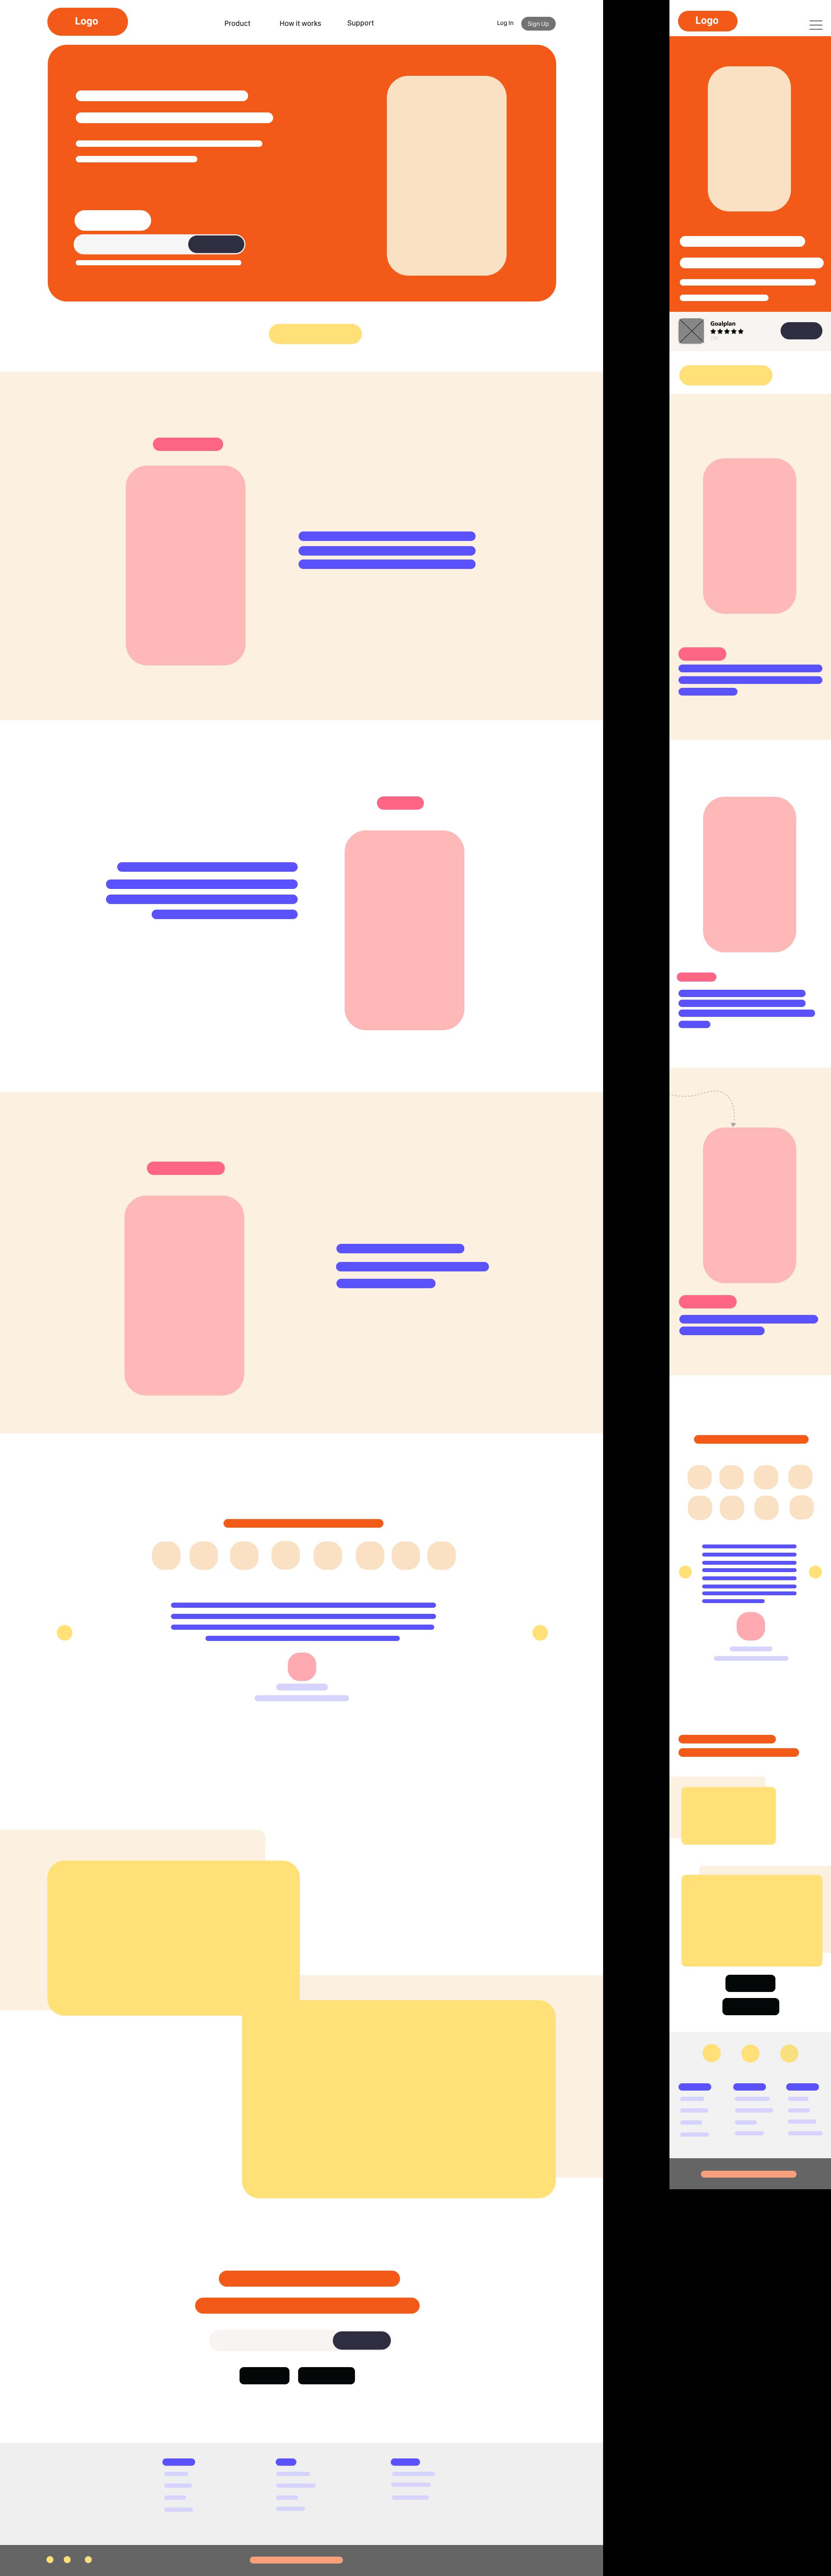 Content-flow-diagram